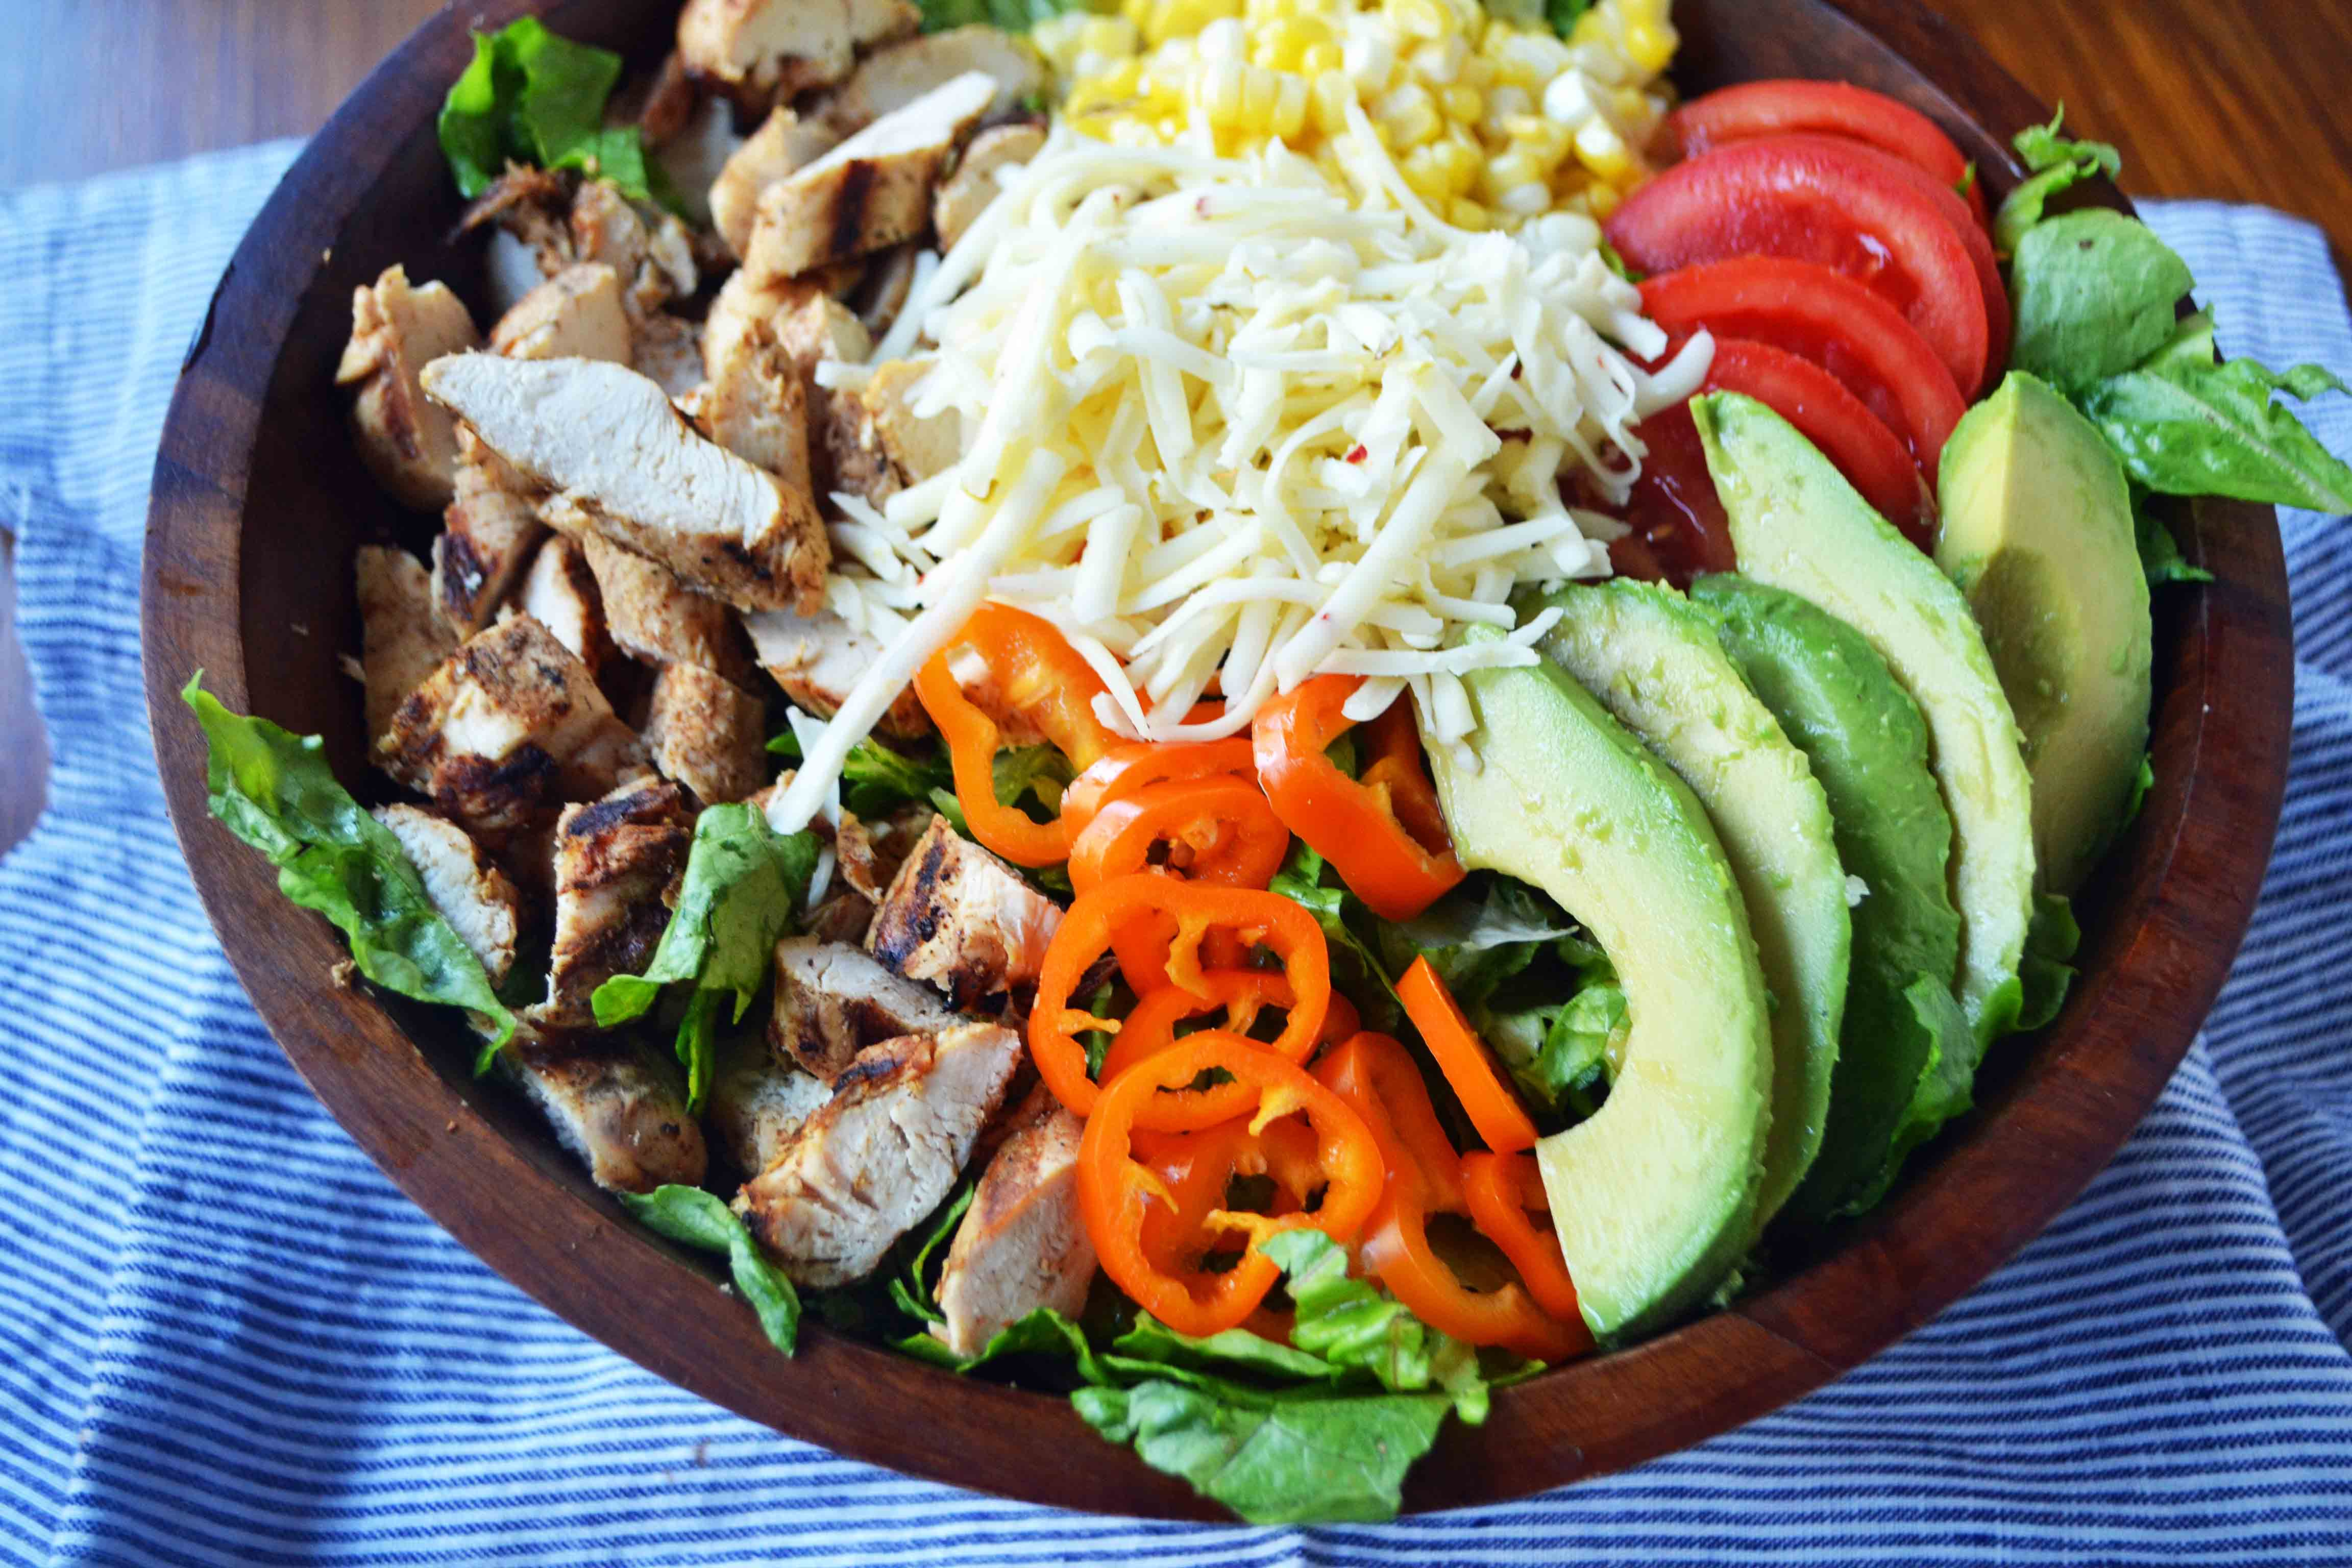 Southwestern Chicken Chopped Salad with Cilantro Lime Ranch by Modern Honey l www.mdoernhoney.com